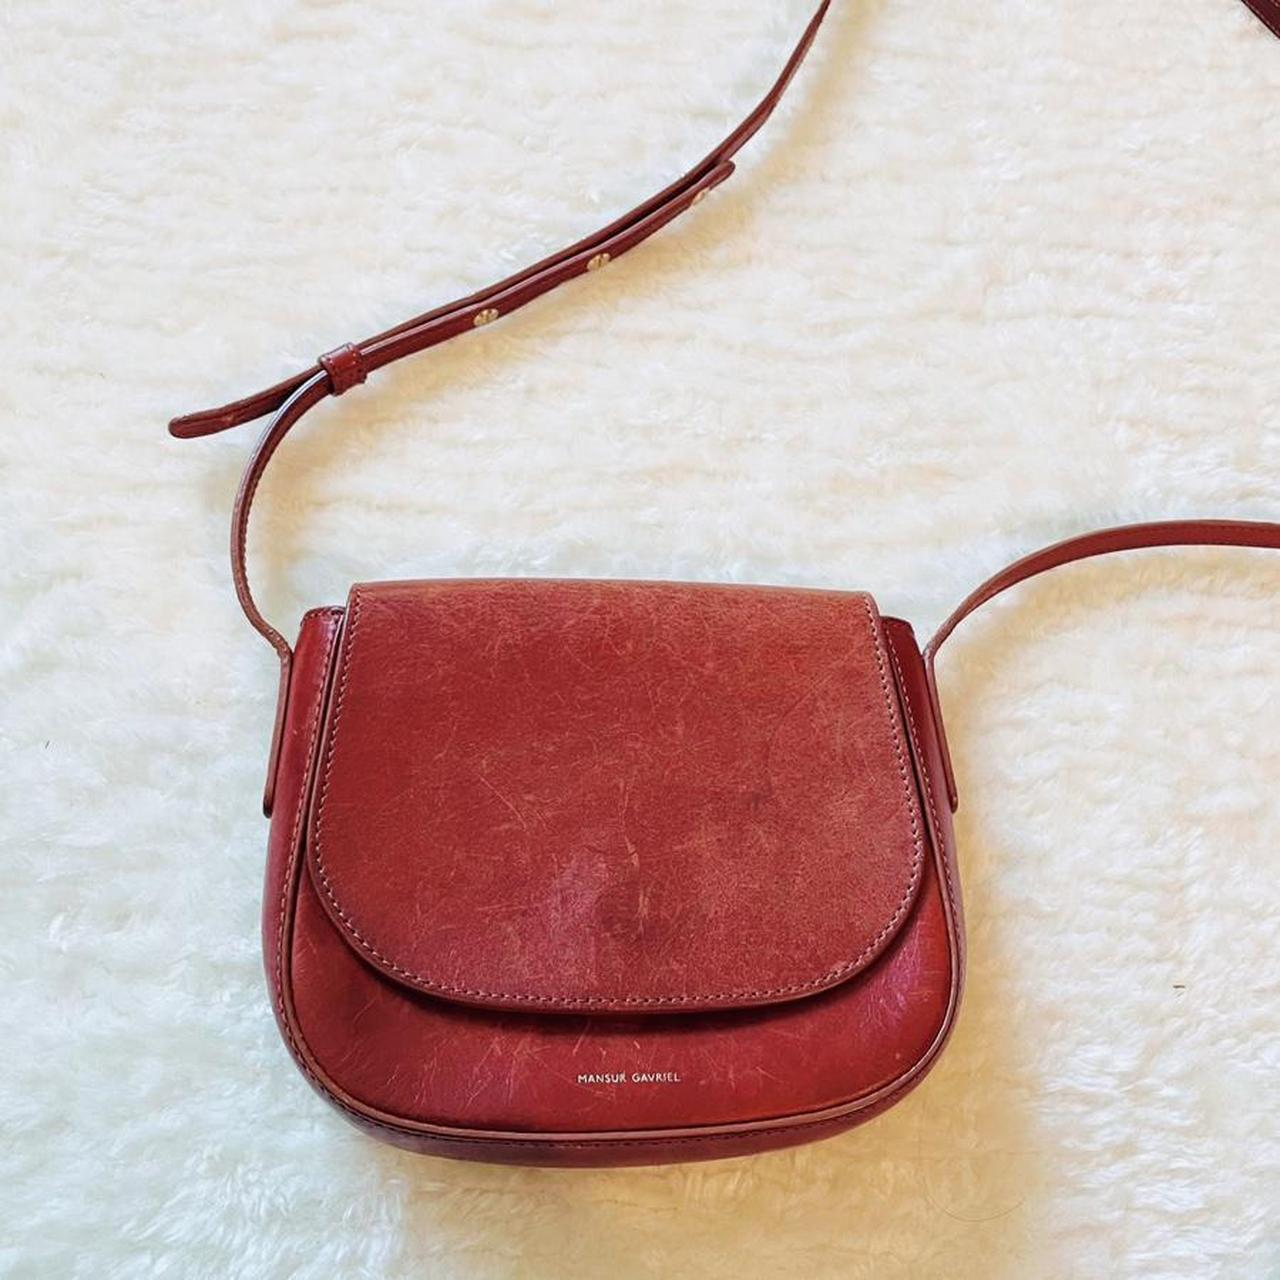 Product Image 1 - Mansur Gavriel Crossbody Bag in